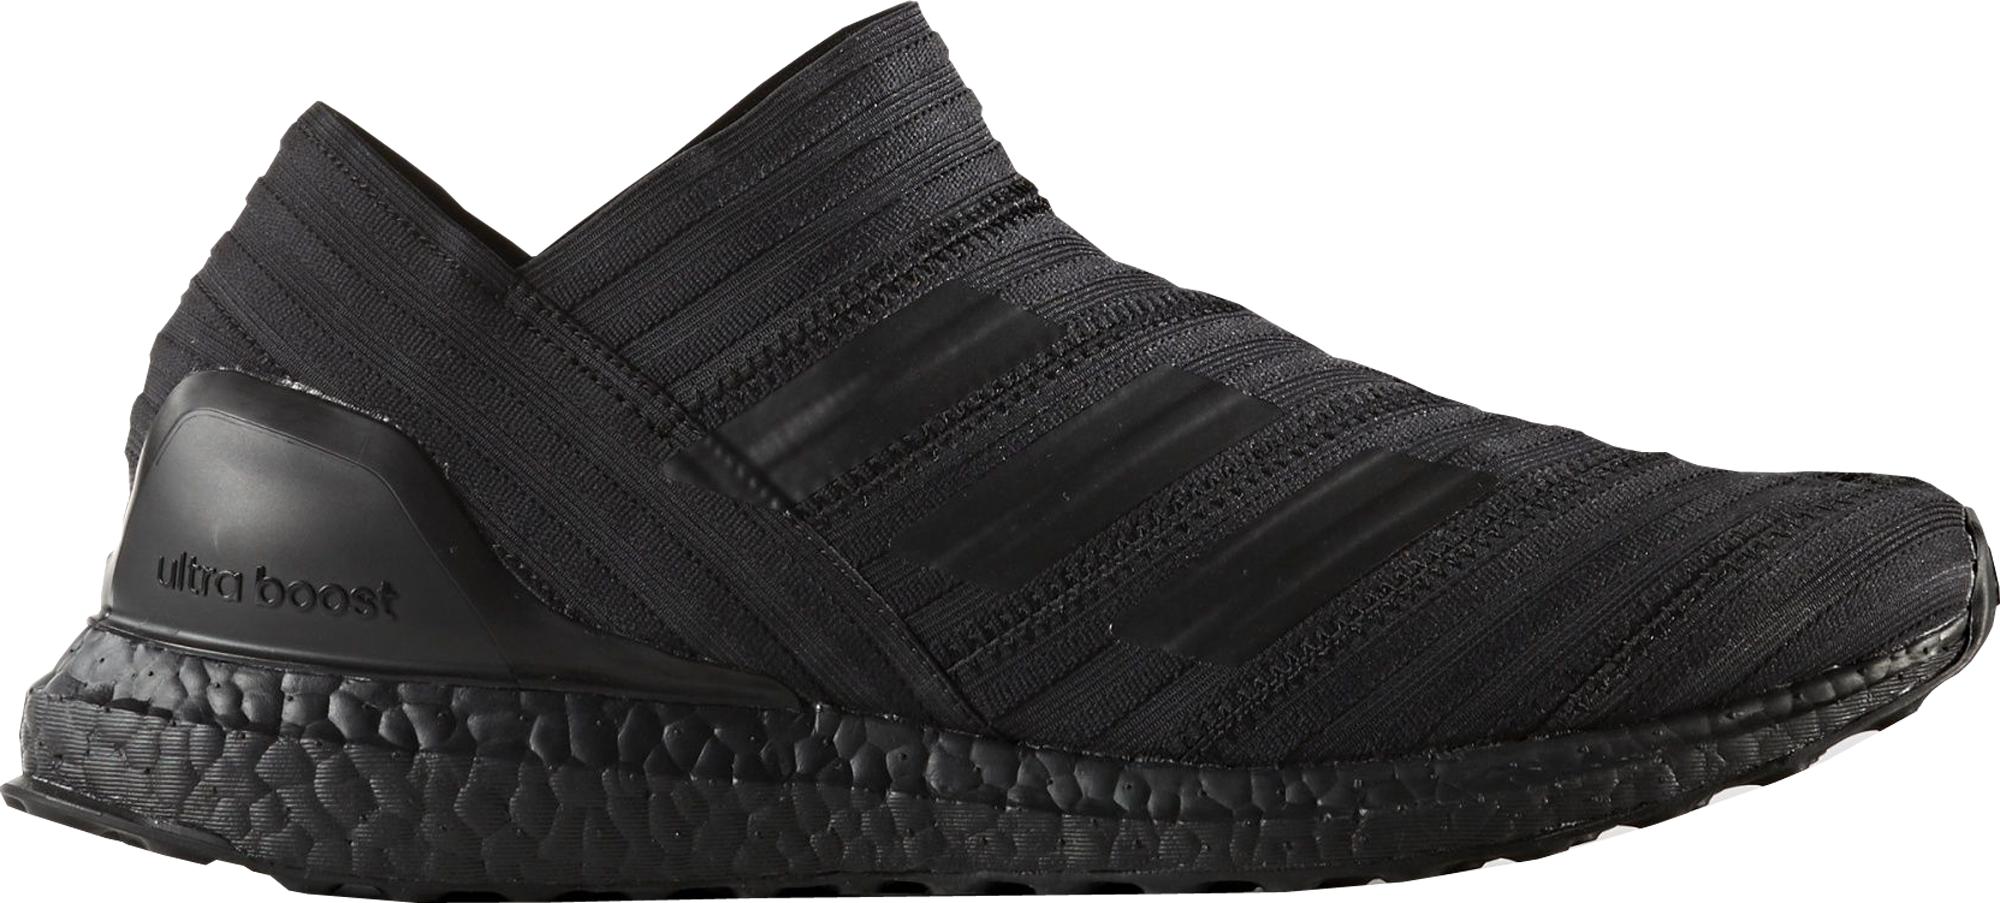 adidas Nemeziz Tango 17 Ultra Boost Triple Black